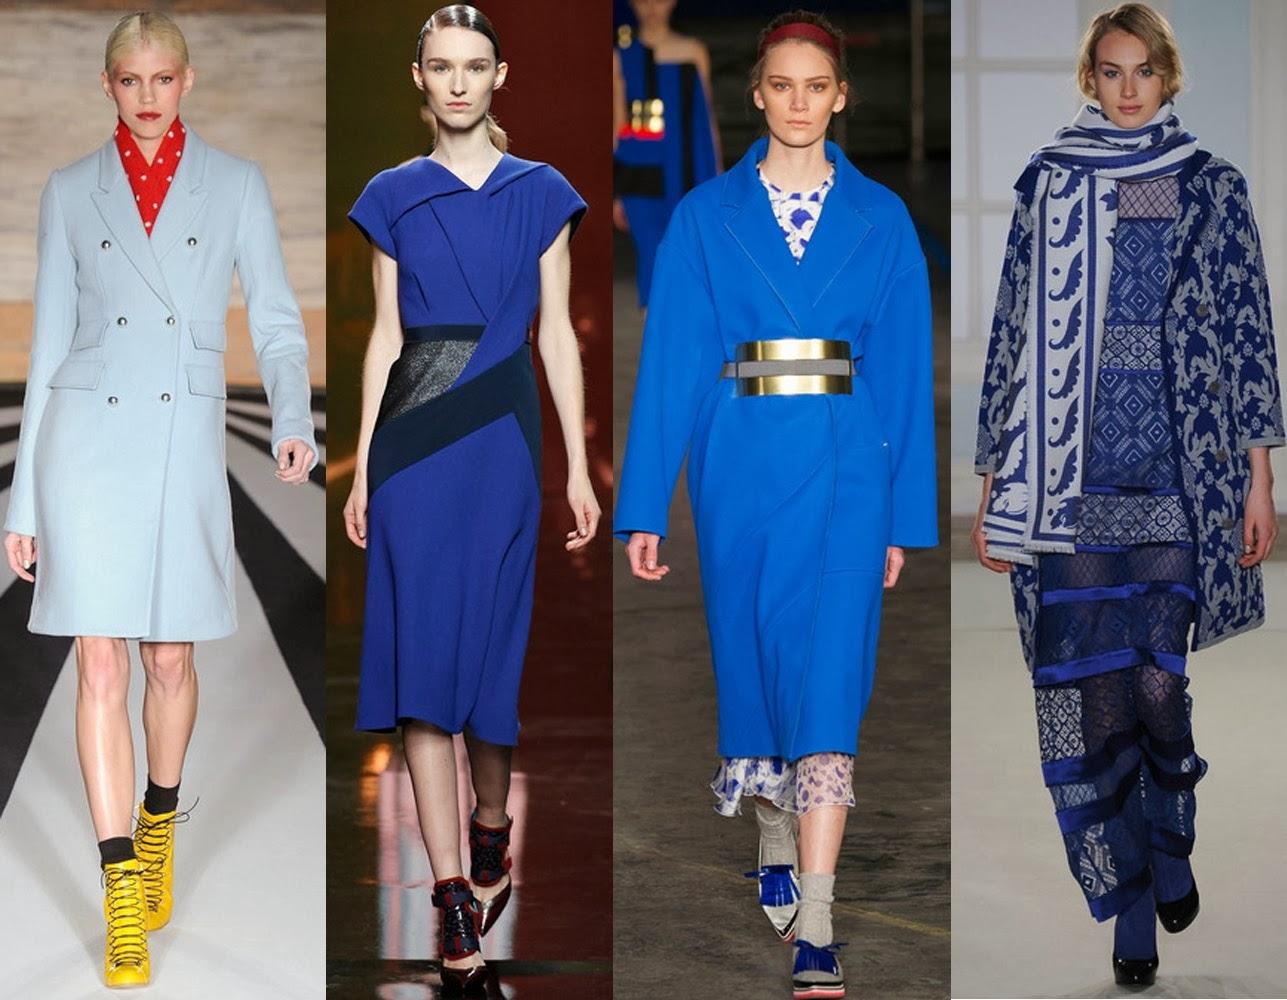 london+fashion+week+fall+2014+trends+blue